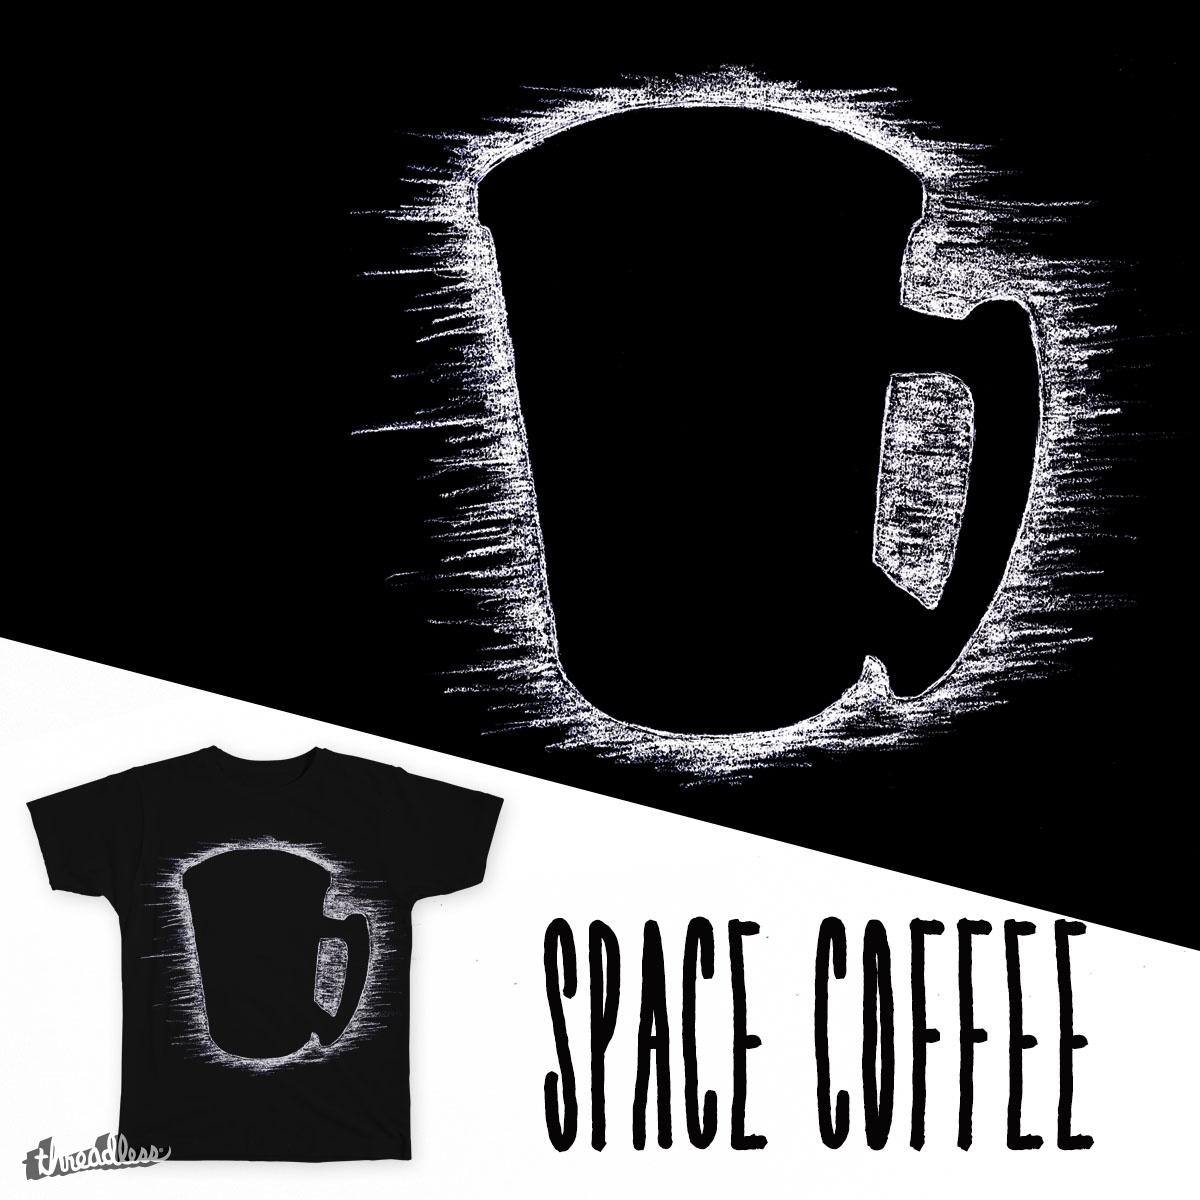 Space Coffee by Miloriginal on Threadless